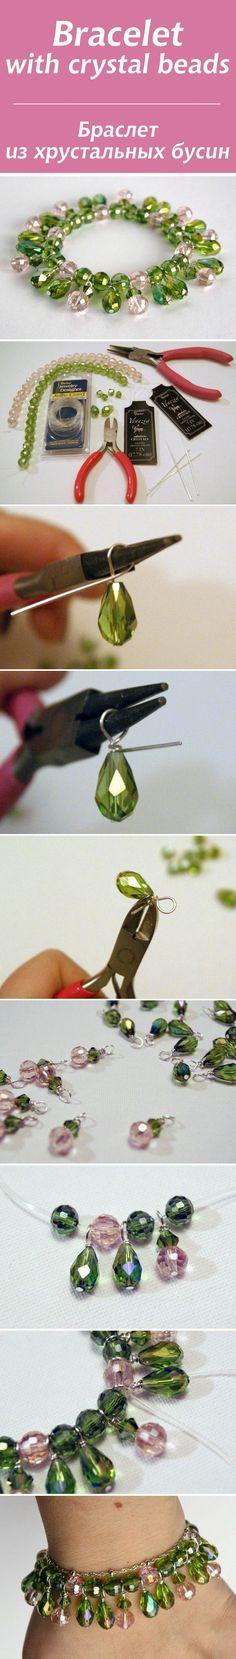 Браслет из хрустальных бусин / Bracelet with crystal beads tutorial #jewelrymaking